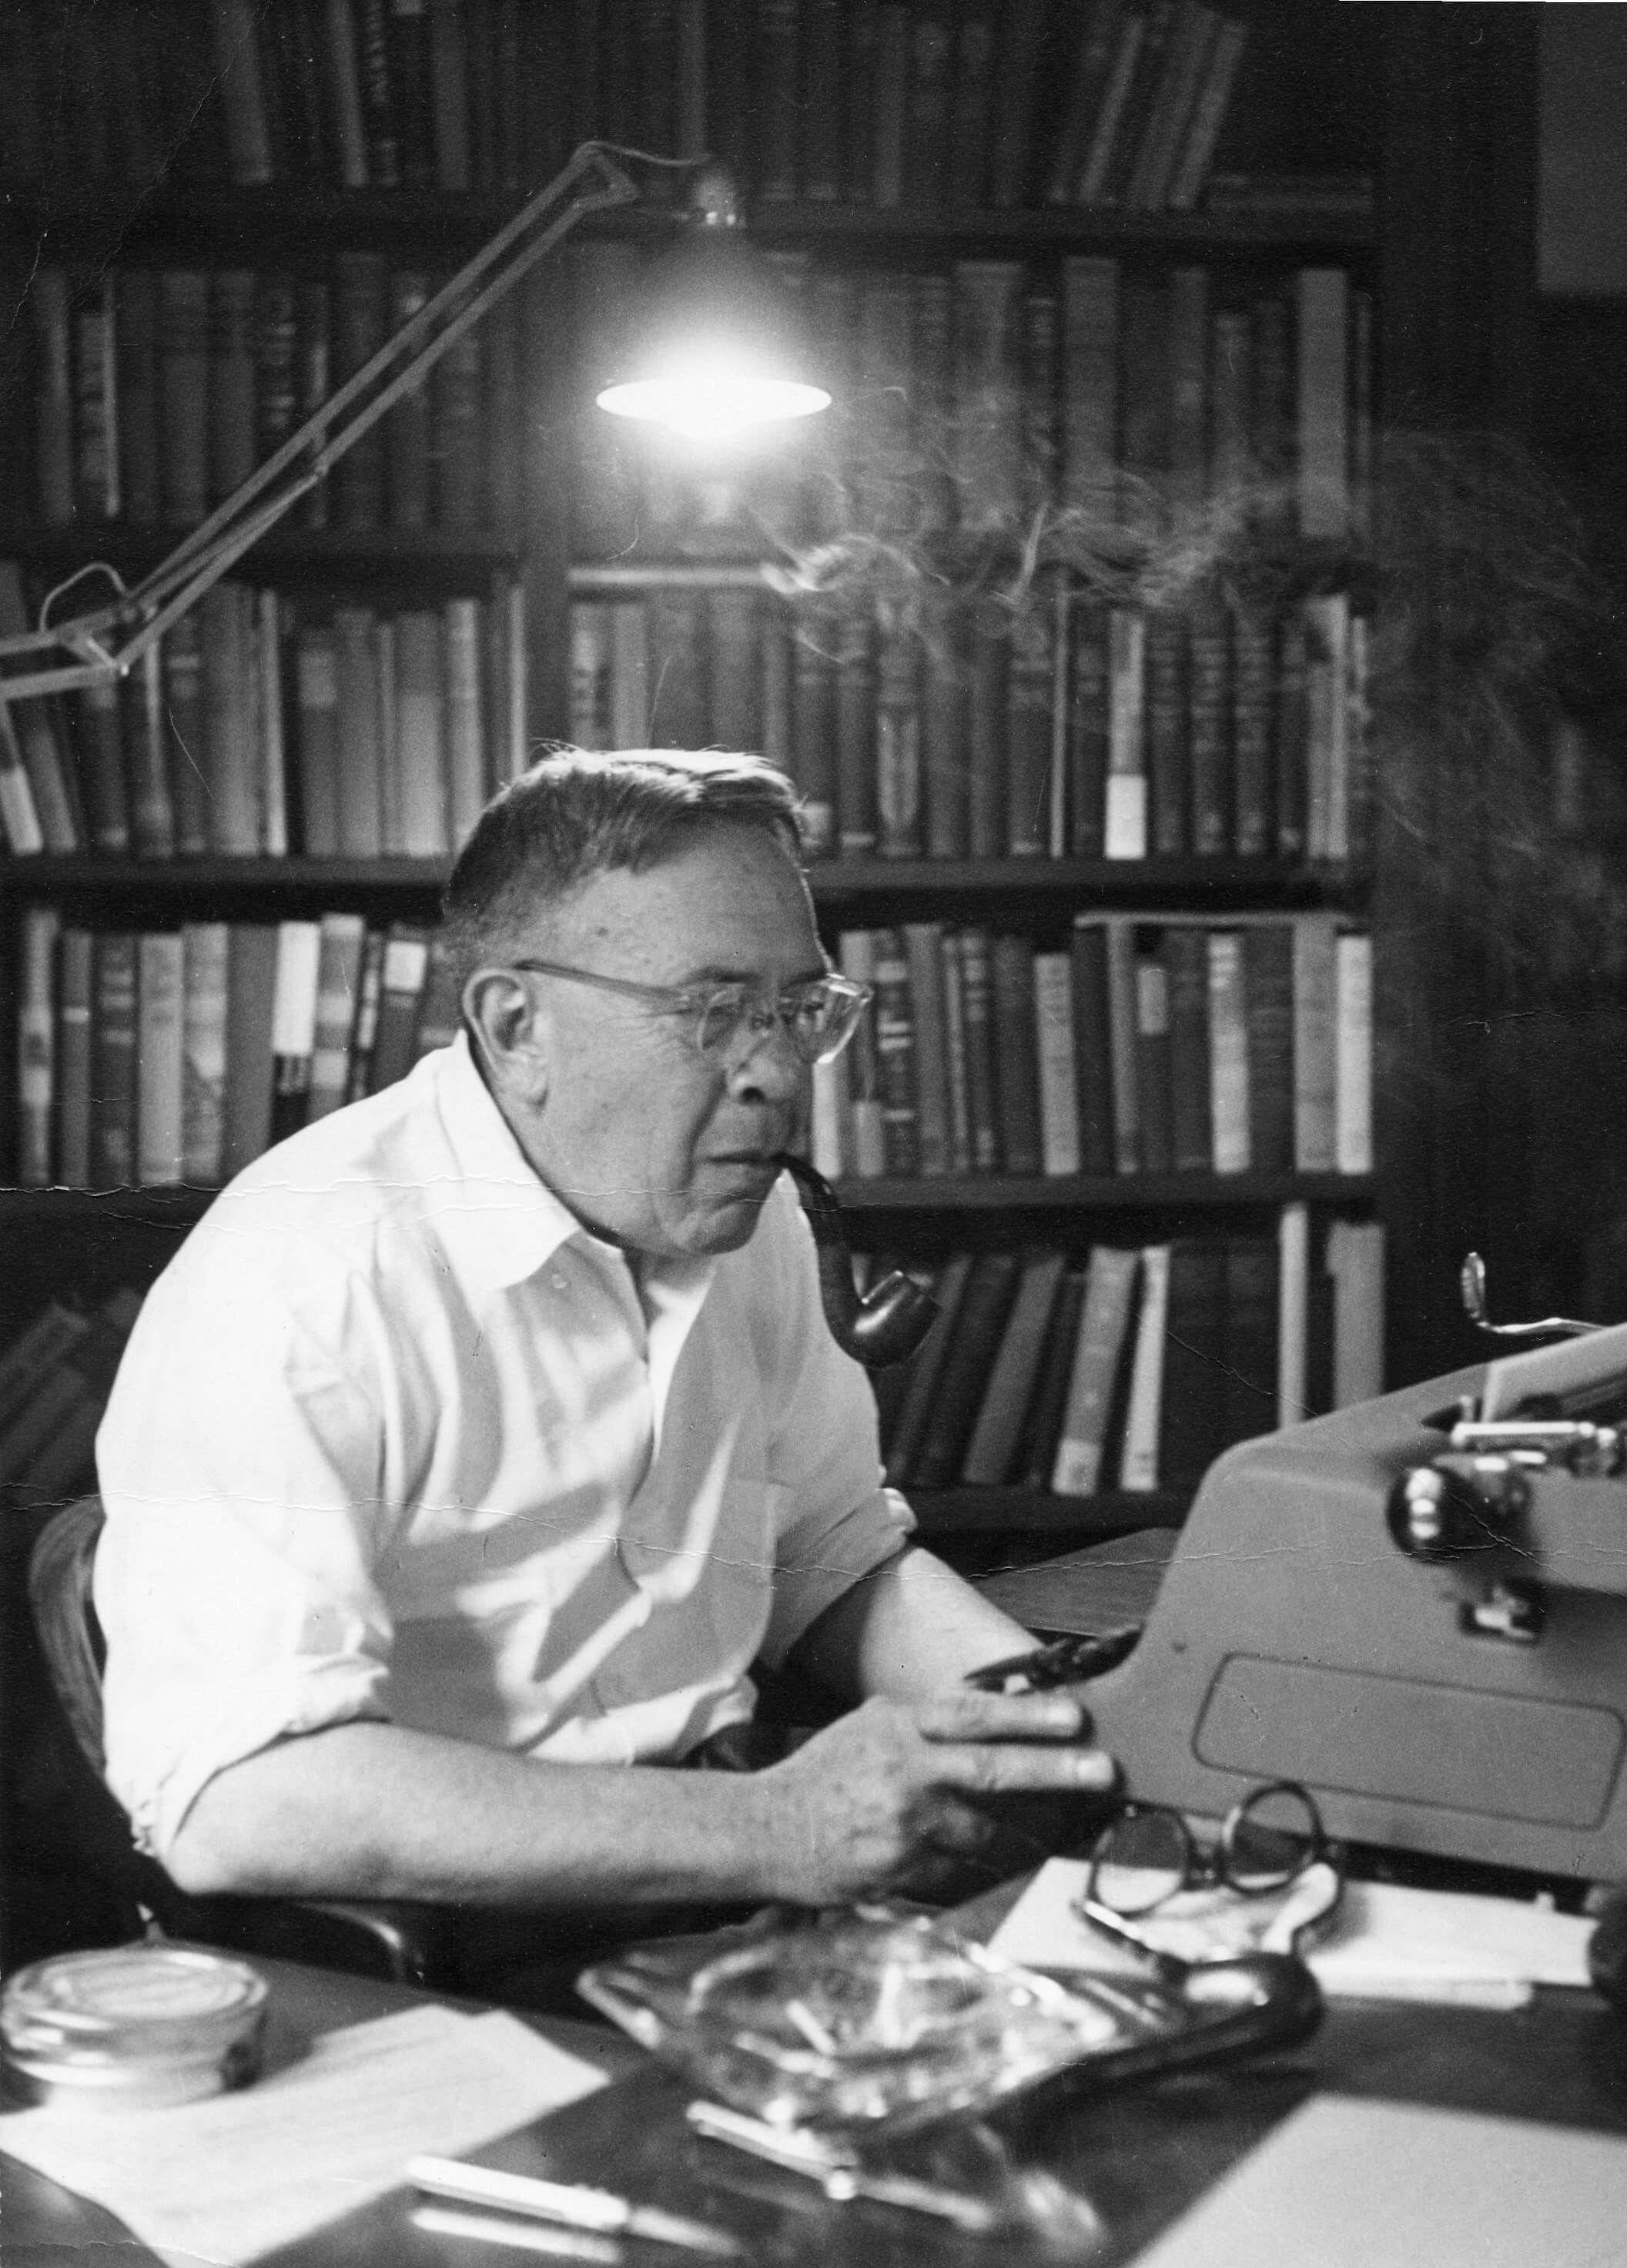 Бернард ДеВото за работой, 1950-е годы. Источник: mdevotomusic.org